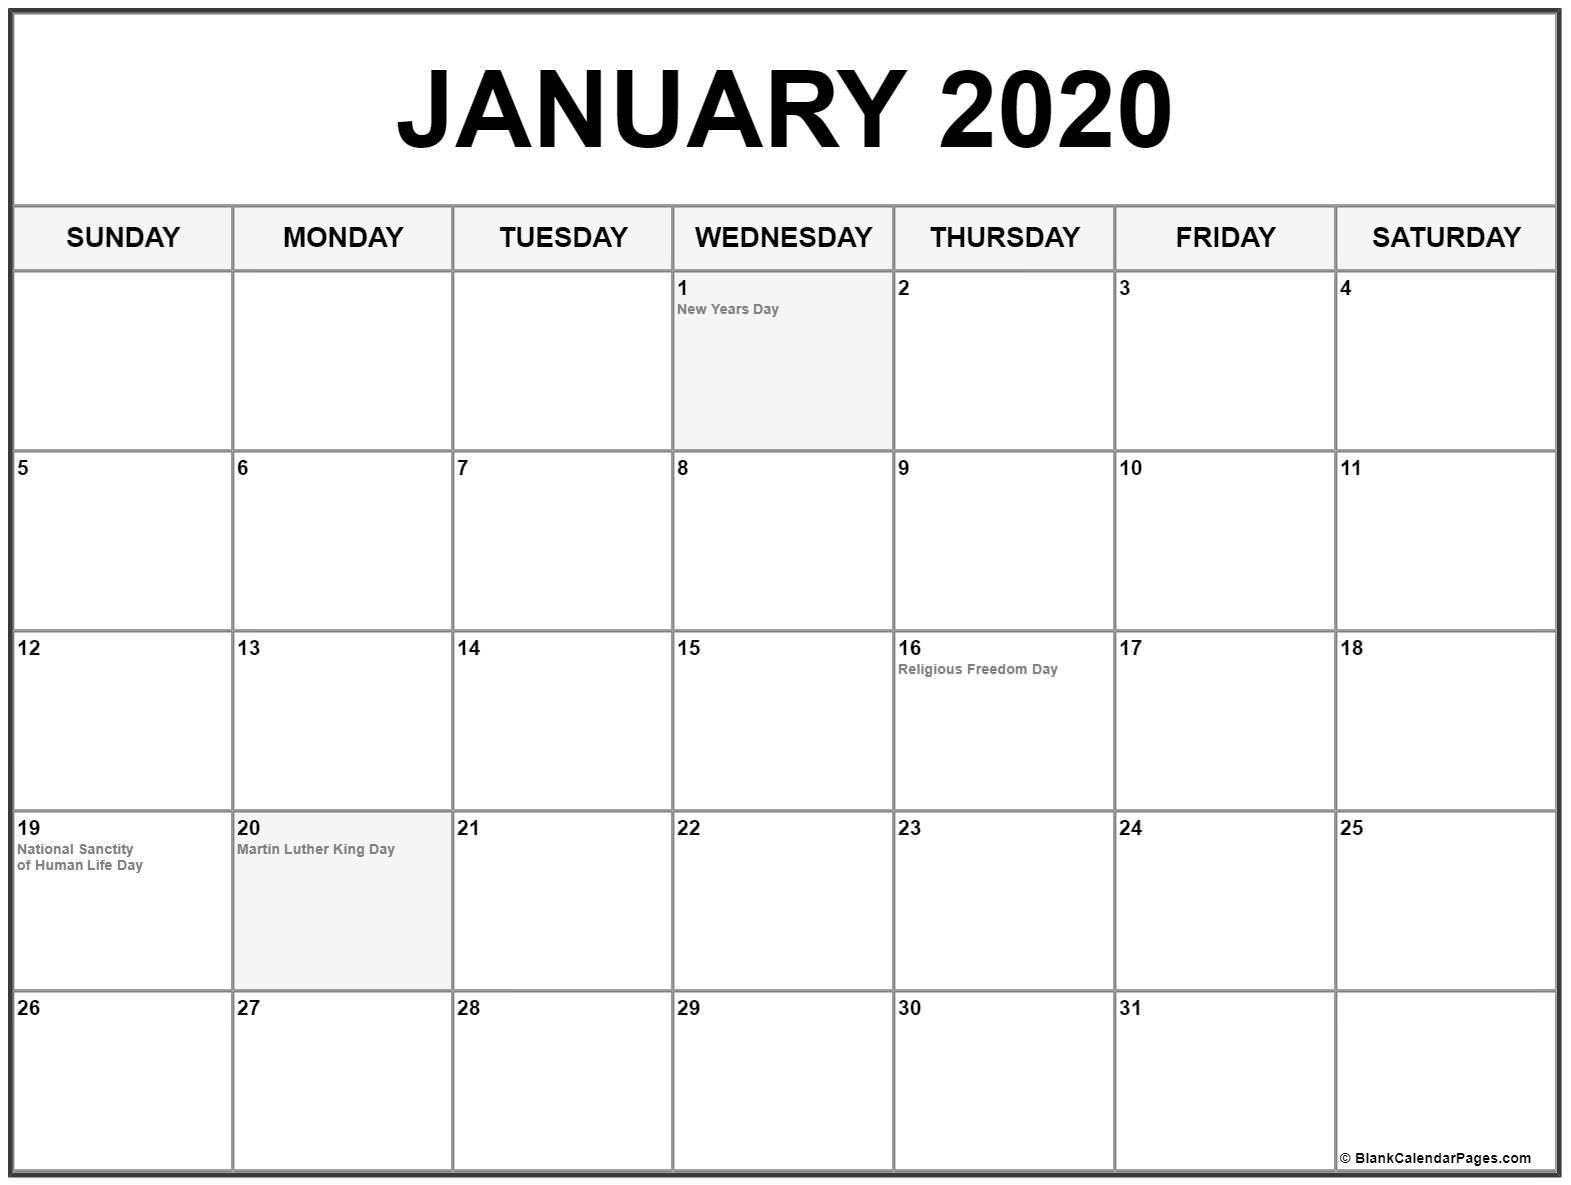 Collection Of January 2020 Calendars With Holidays-January 2020 Calendar Usa